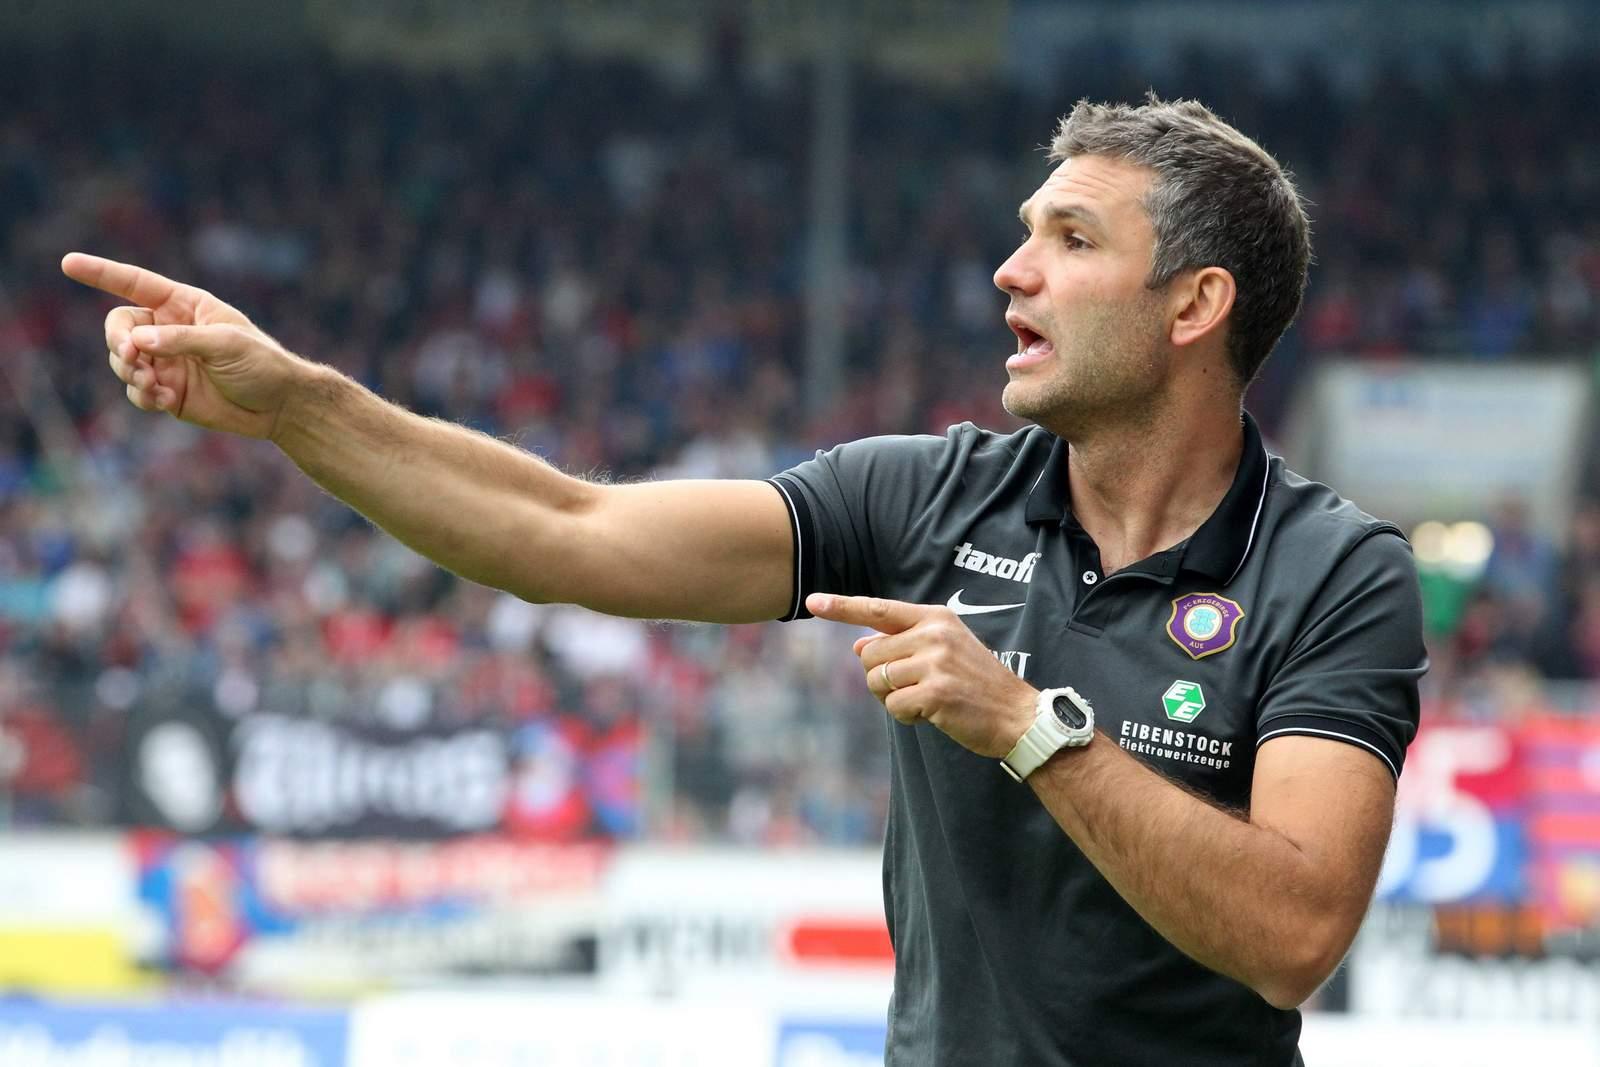 Tomislav Stipic, Trainerkandidat in Chemnitz